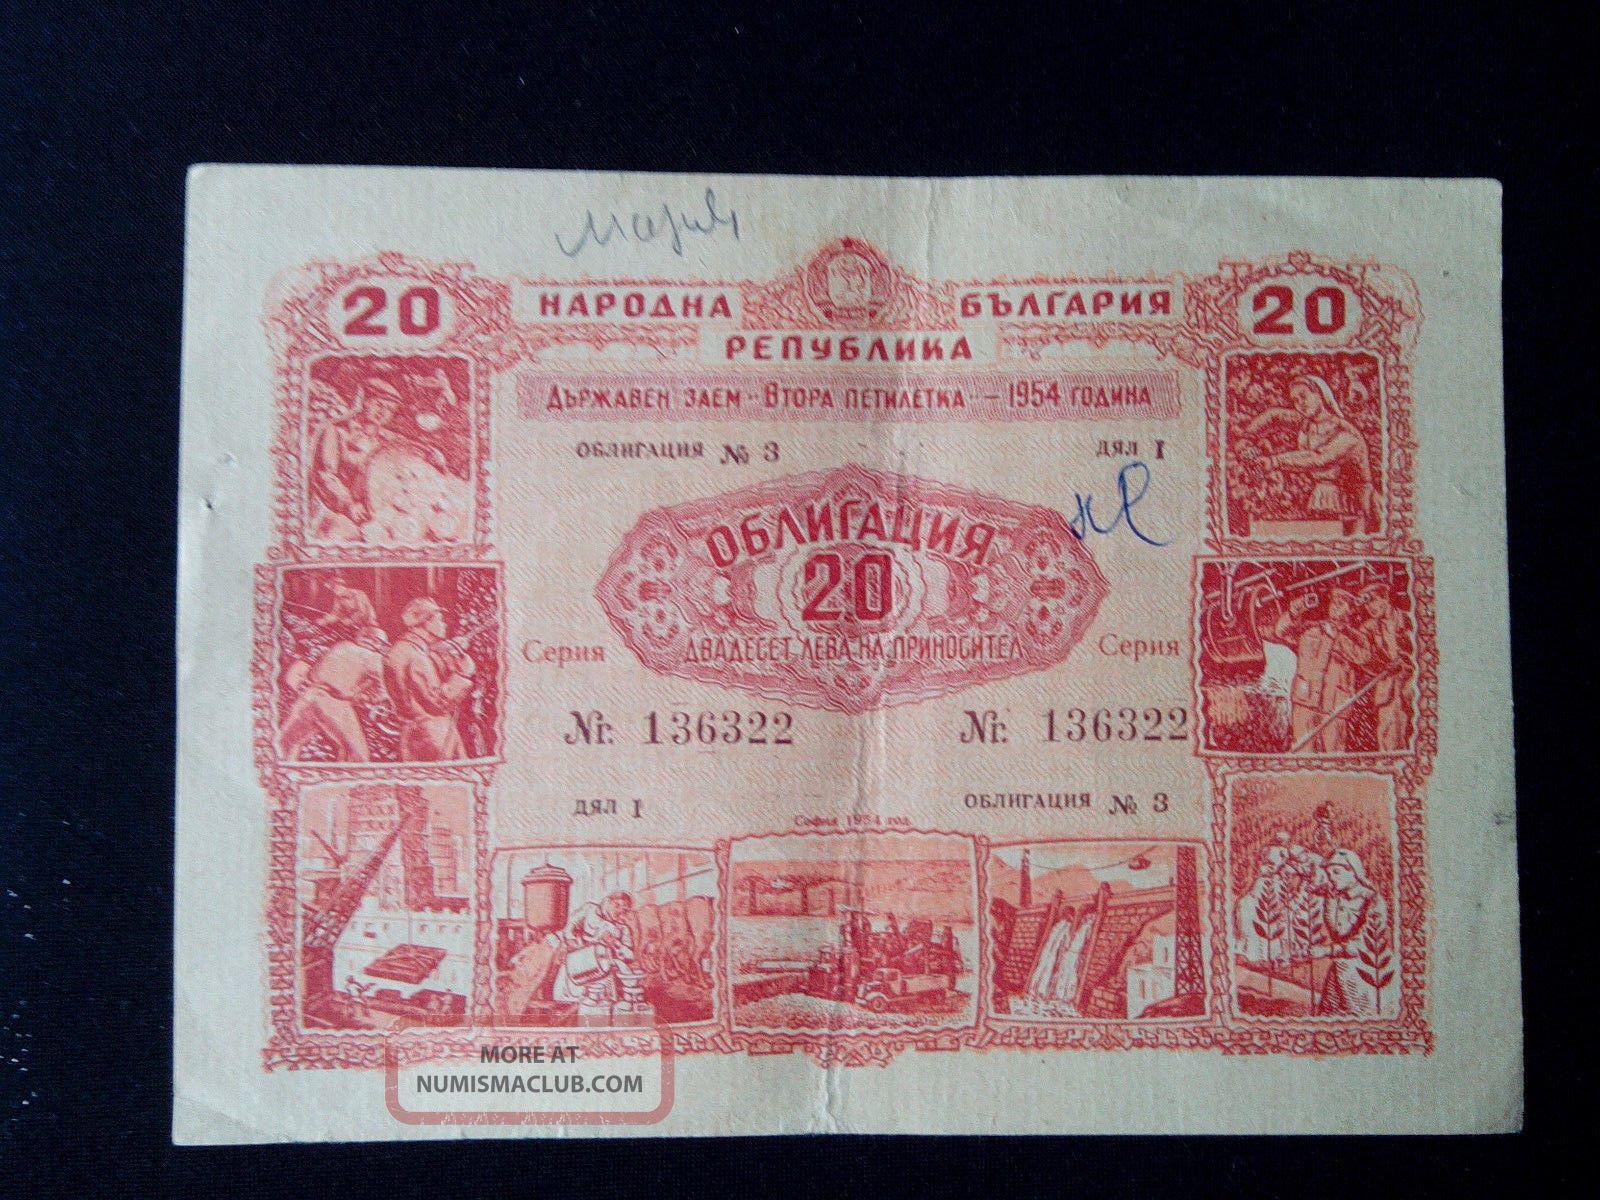 Extremely Rare 20 Leva Bulgaria Old Share Stock Bond 1954 Vintage Certificate World photo